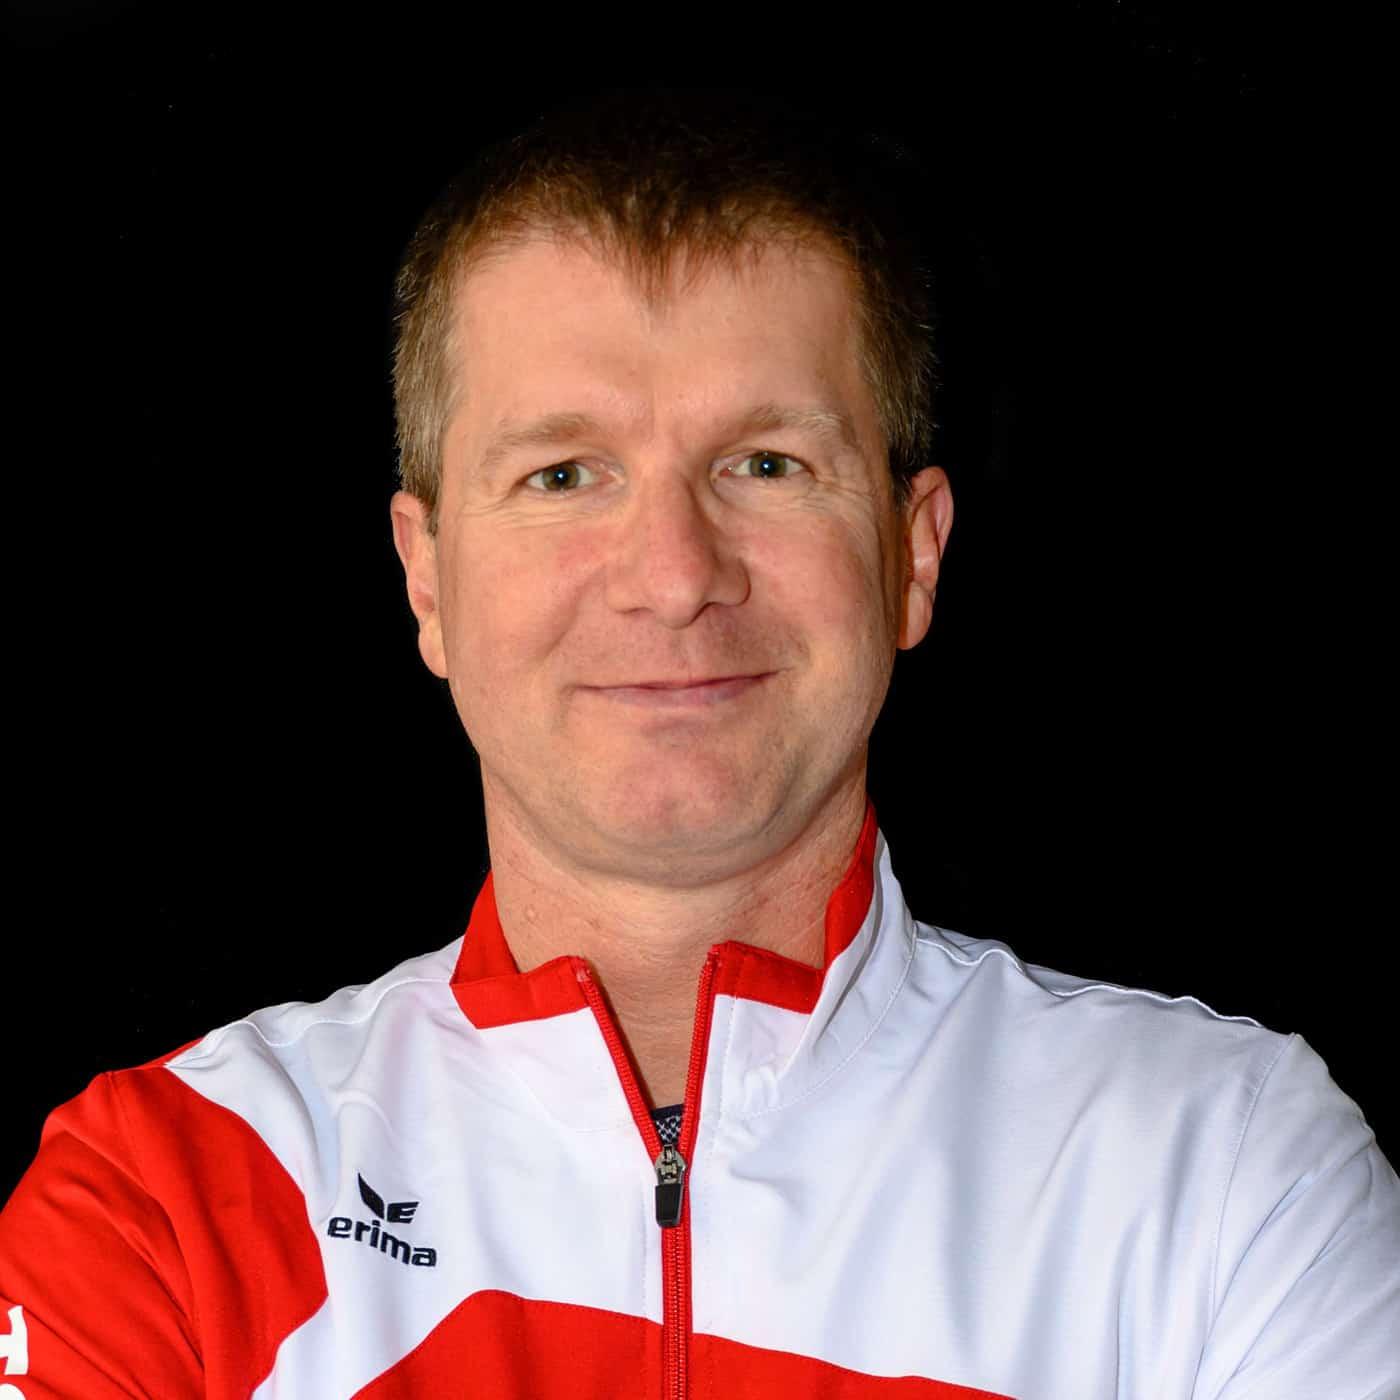 Markus Lauff